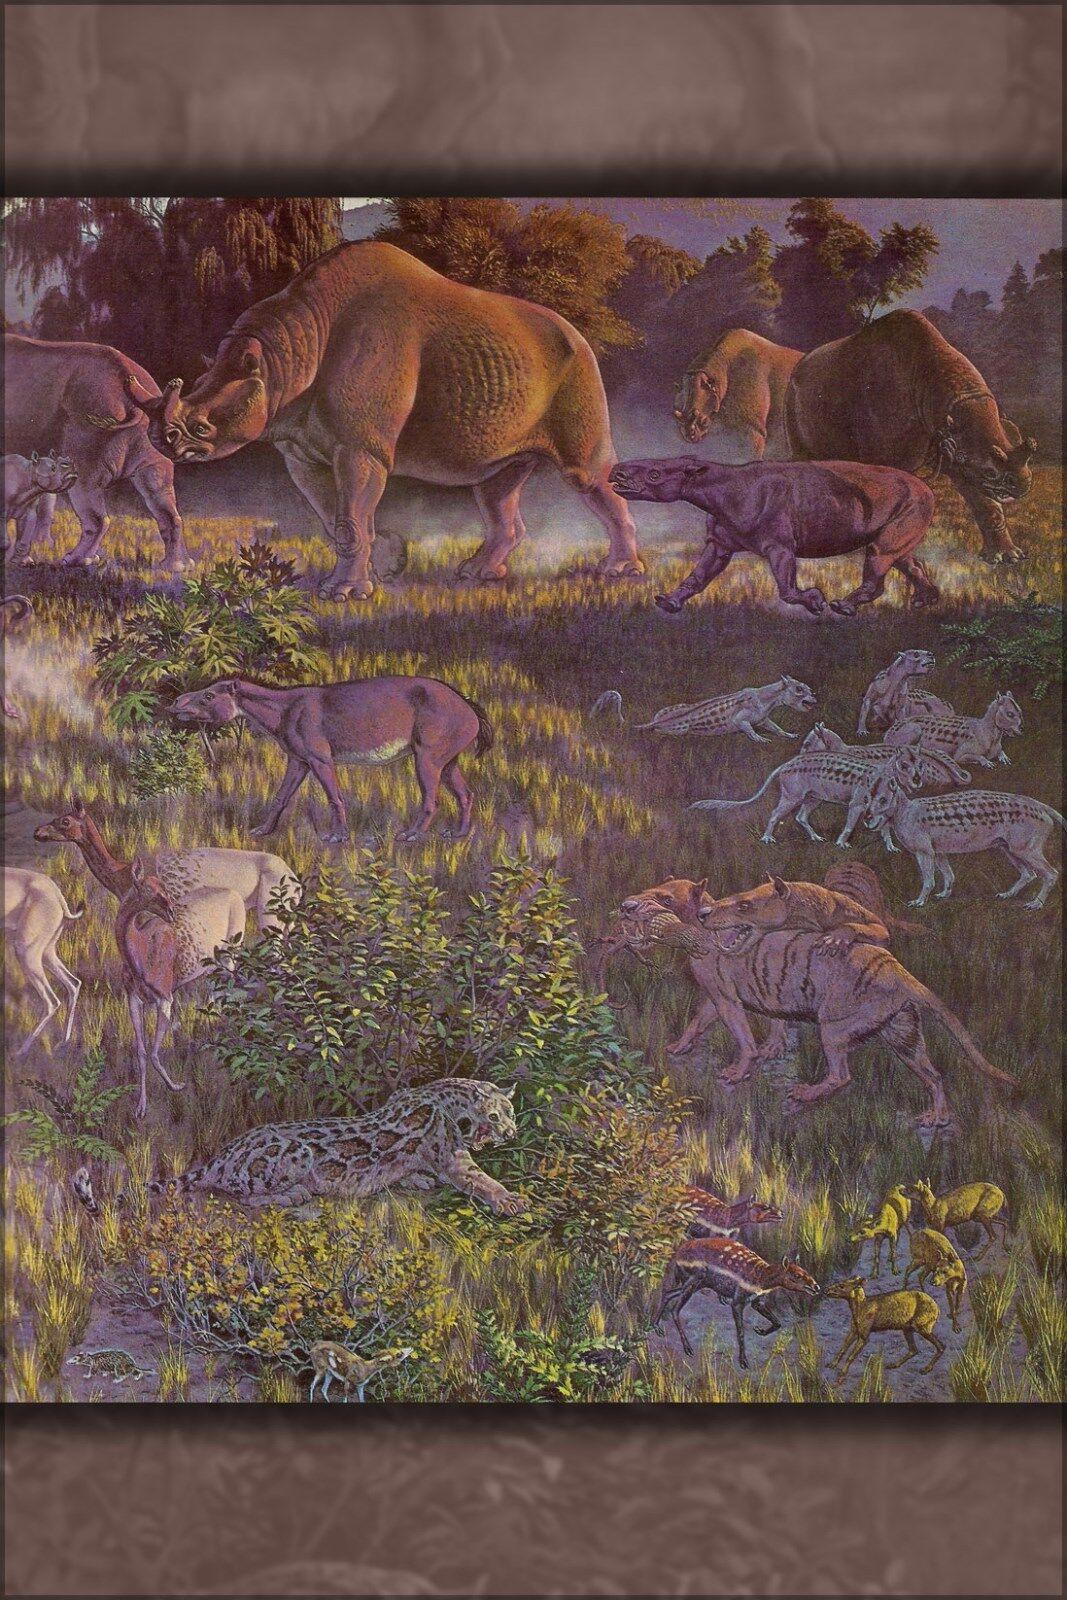 Poster, Molte Misure; Oligocene Fauna Museo Of North America, Smithsonian Museo Fauna 1964 51be09